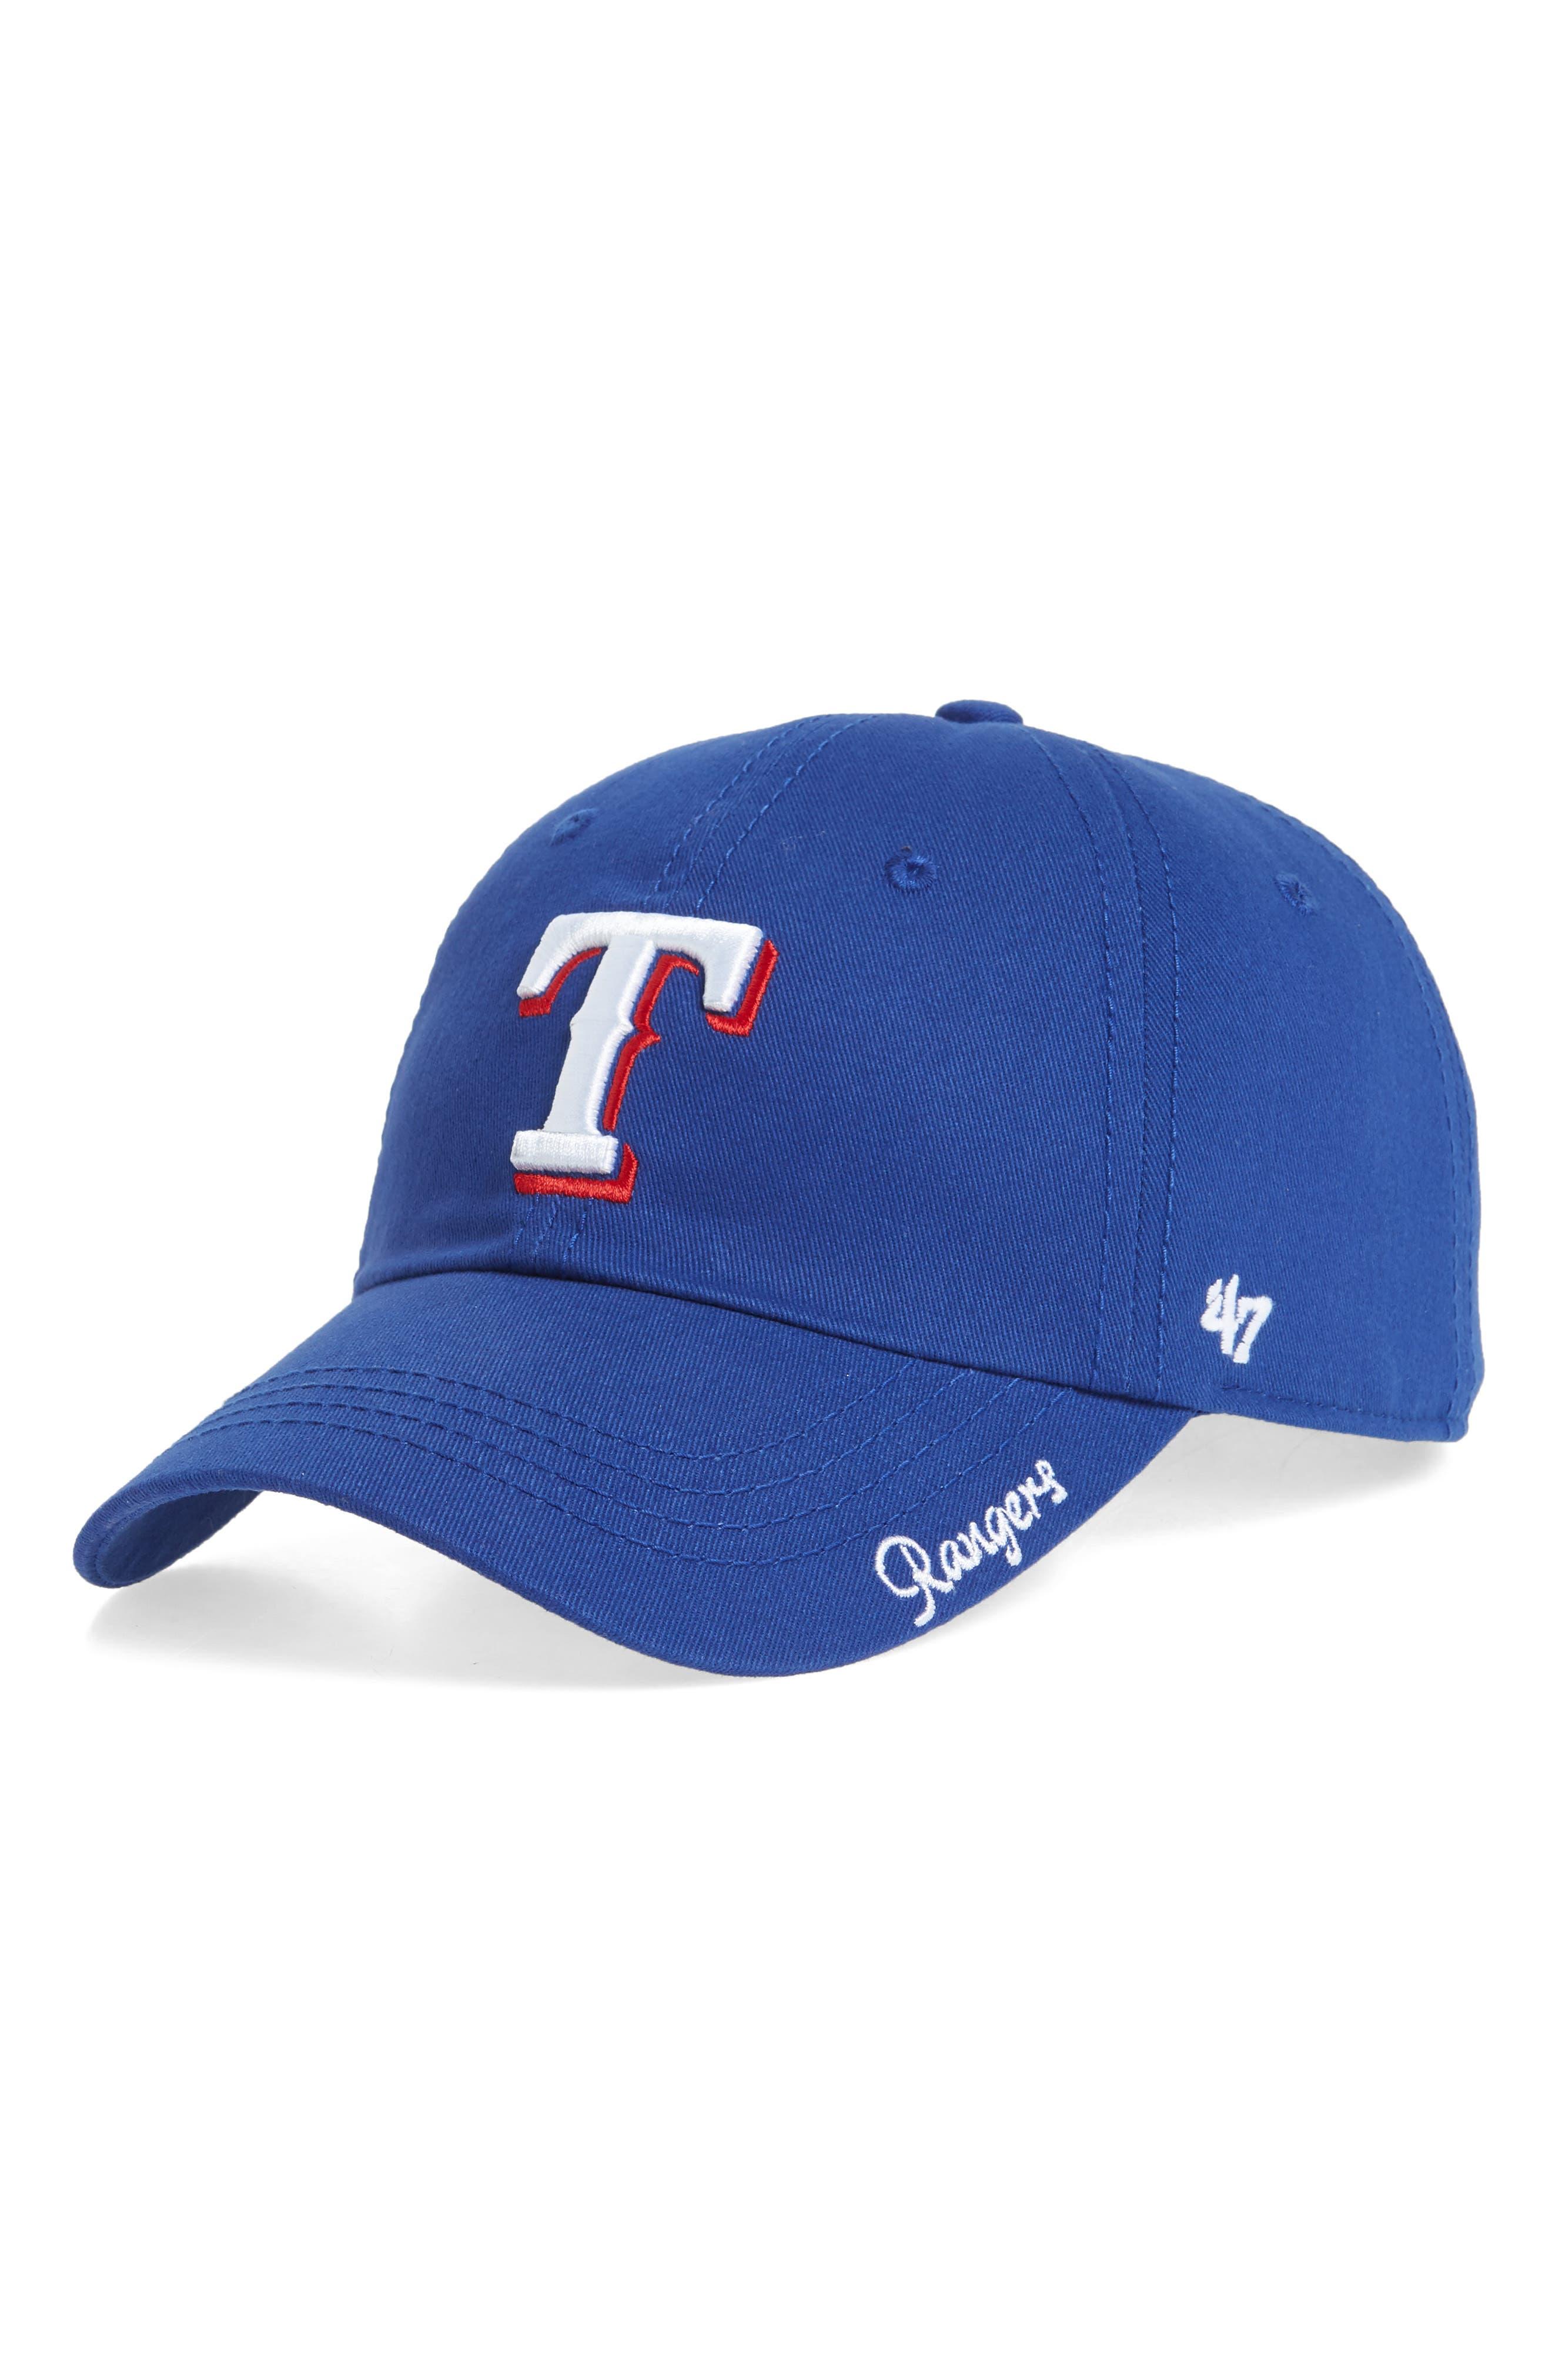 Miata Clean-Up Texas Rangers Baseball Cap,                         Main,                         color, Royal